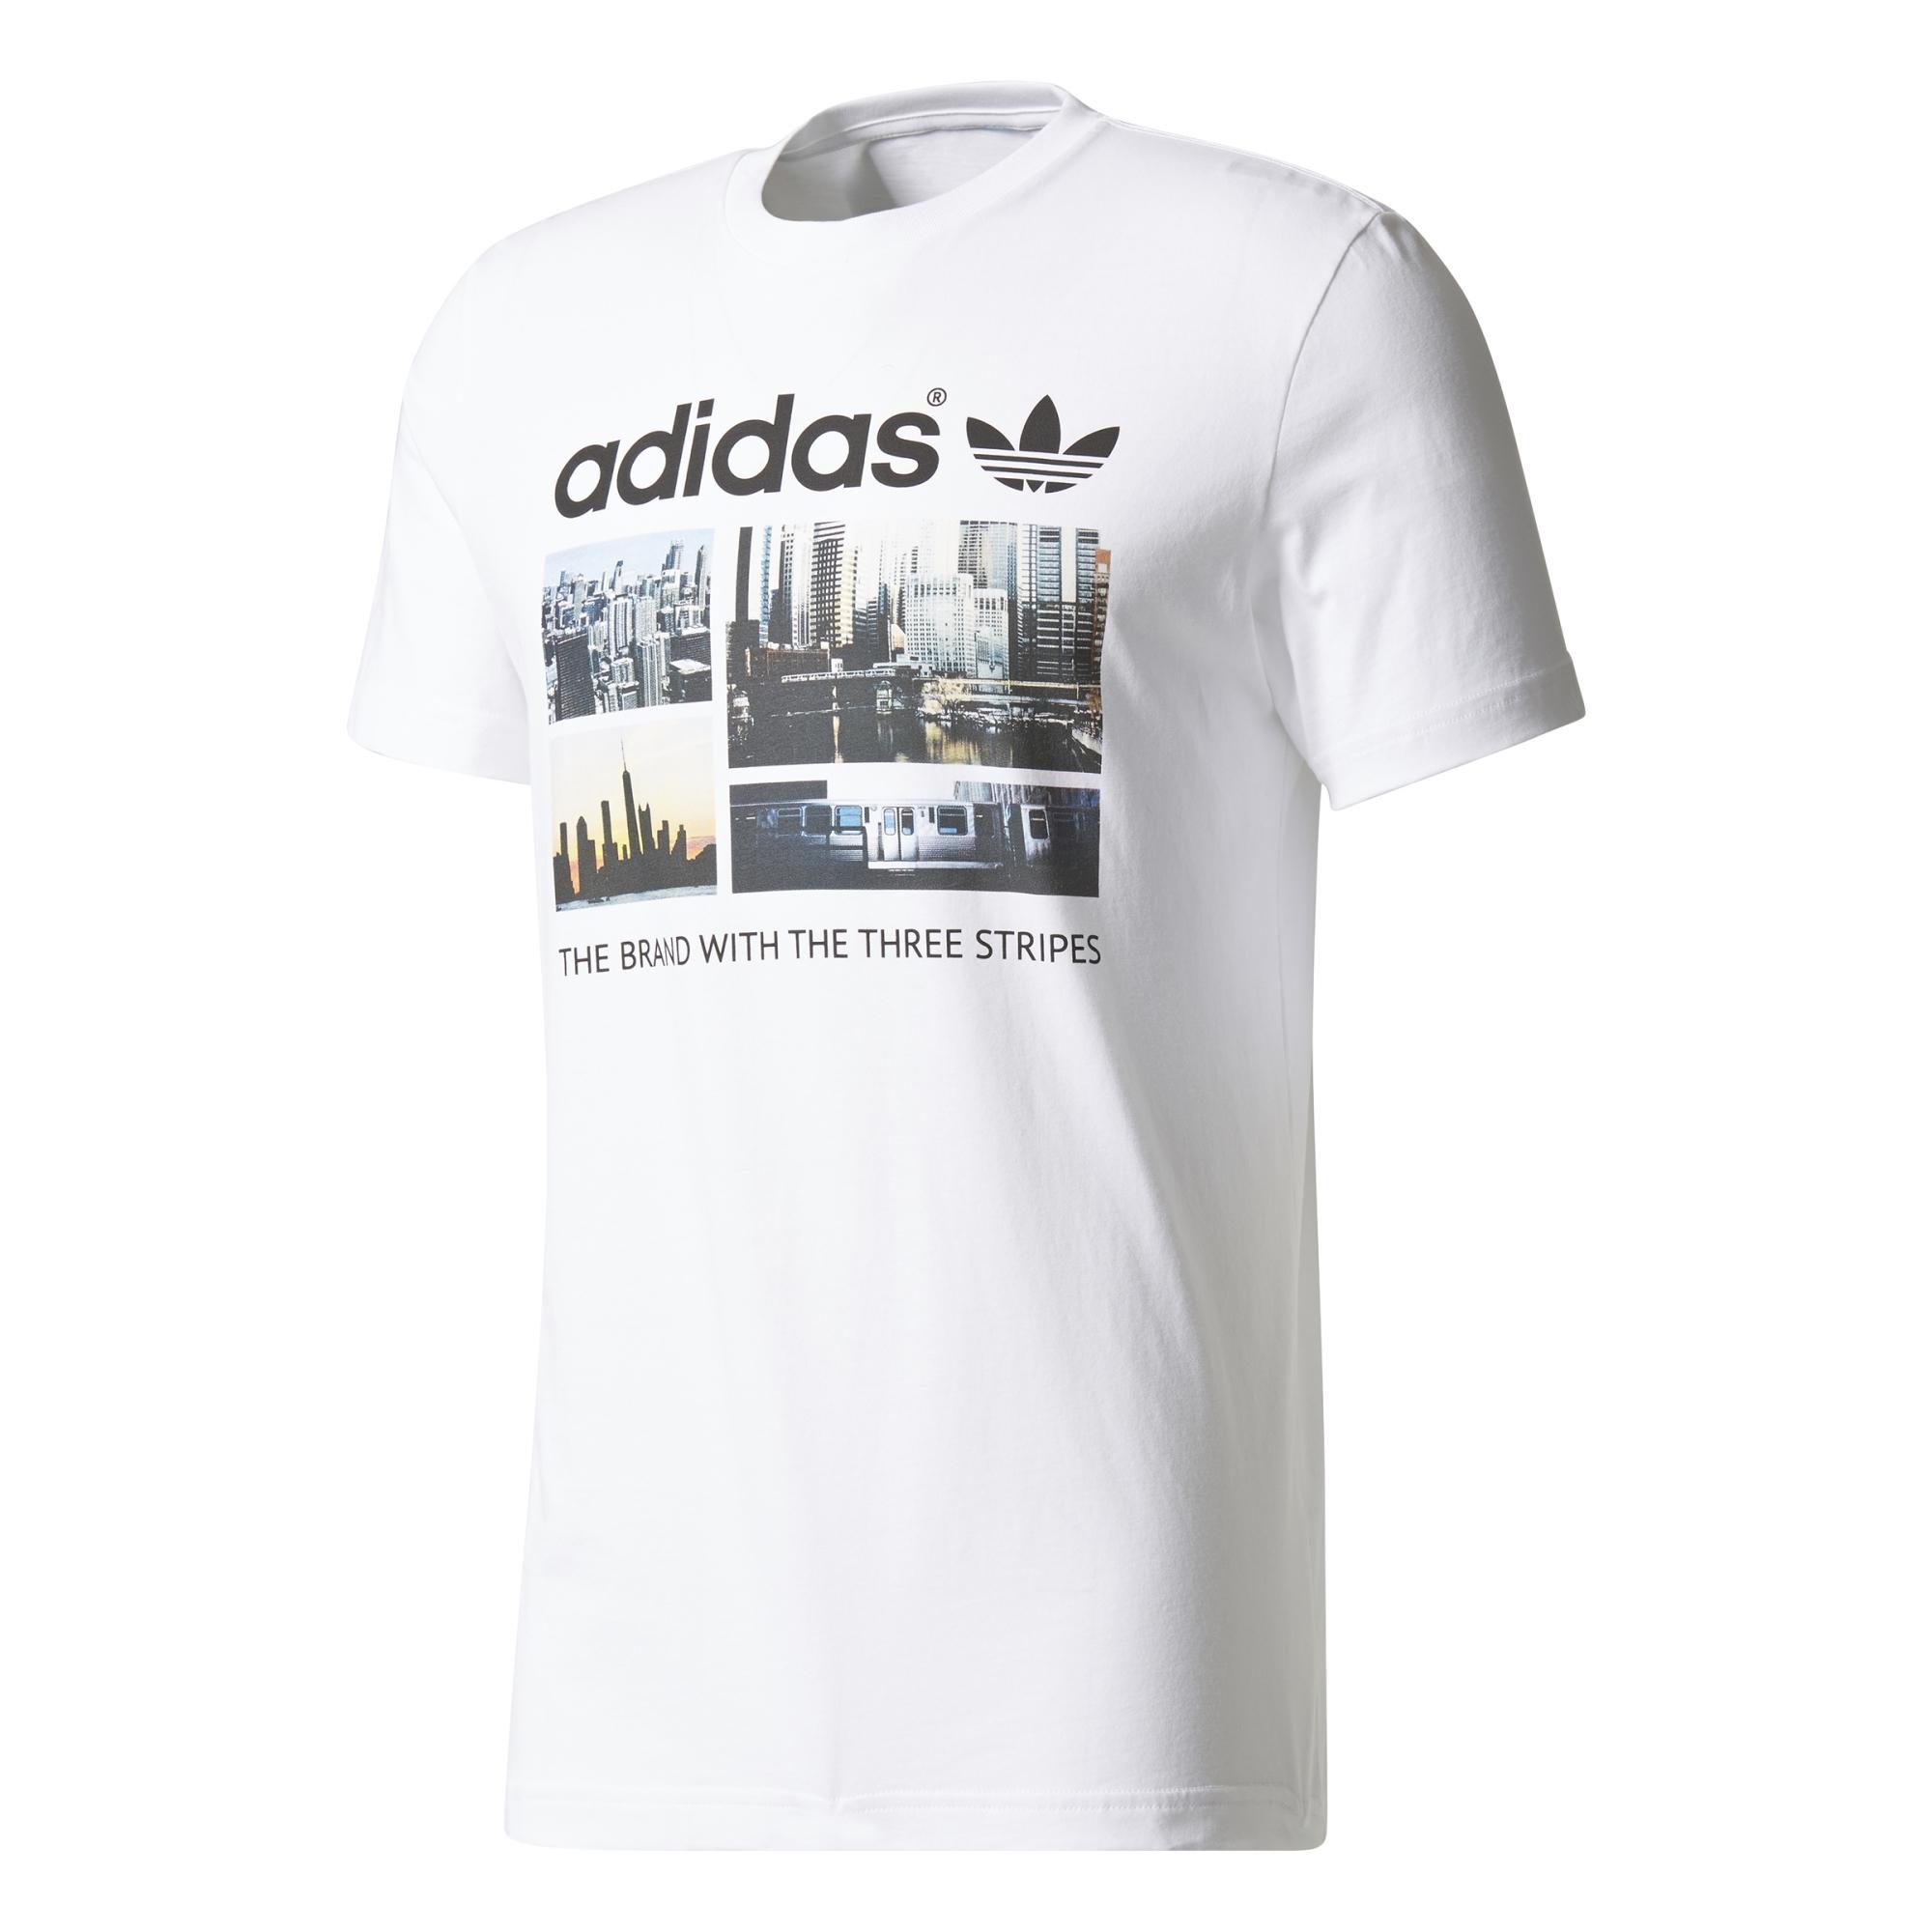 Berlin Adidas Tee Camiseta Ss Corta Manga Hombre Blanco De qdpdUWwrP 458b4853479c7